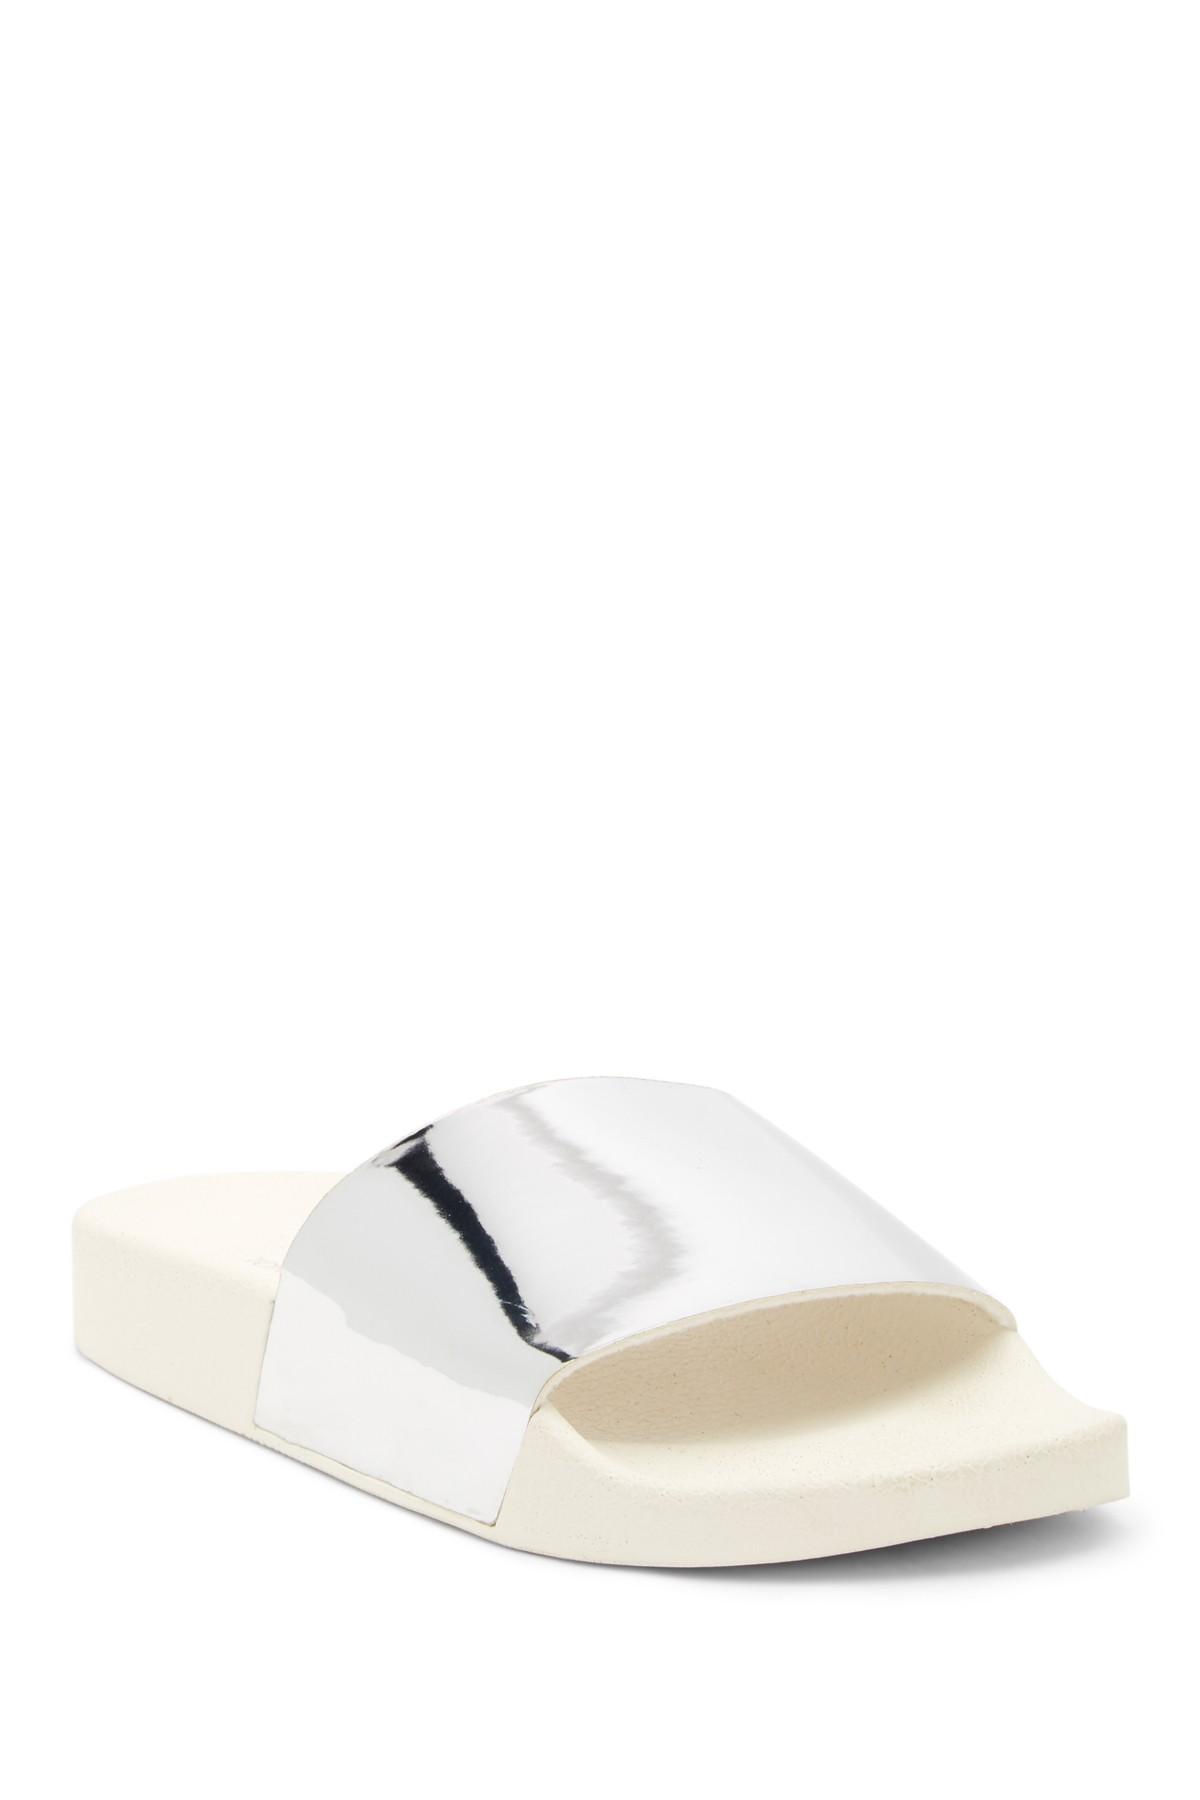 293c244d249 Lyst - Tony Bianco Slide Sandal in Metallic